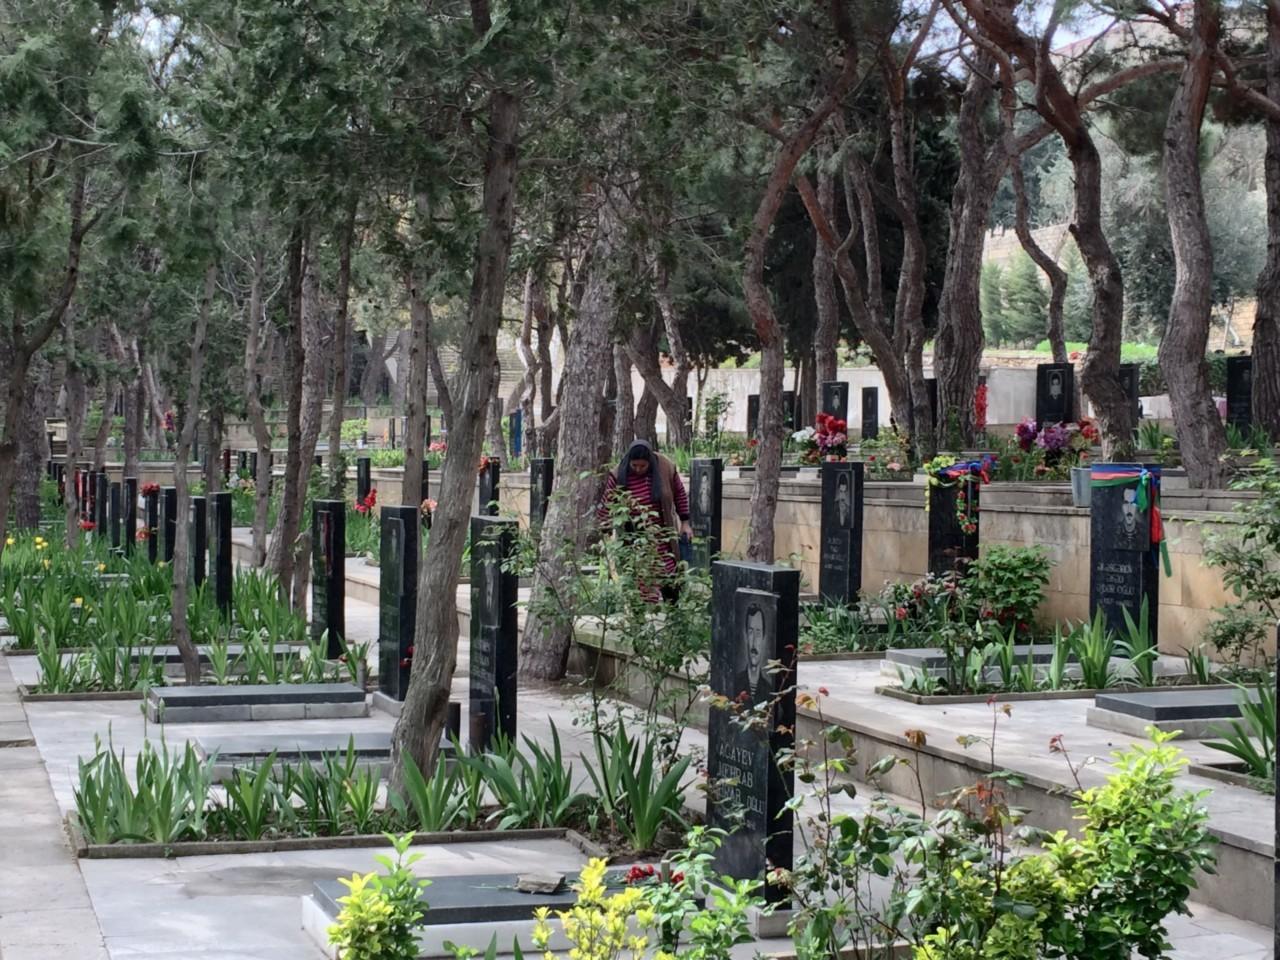 Martyr's Alley Garden